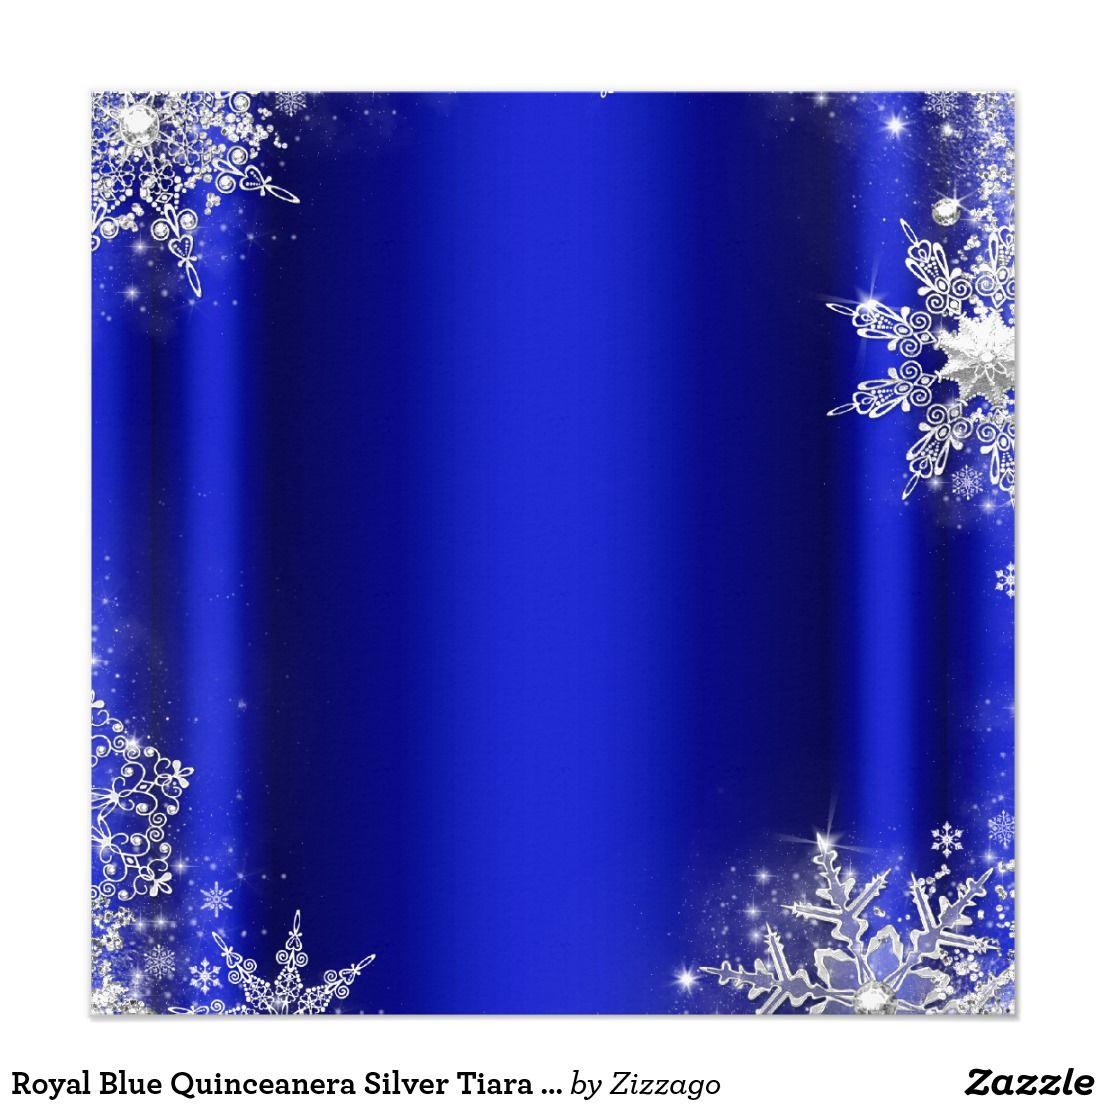 royal blue quinceanera silver tiara